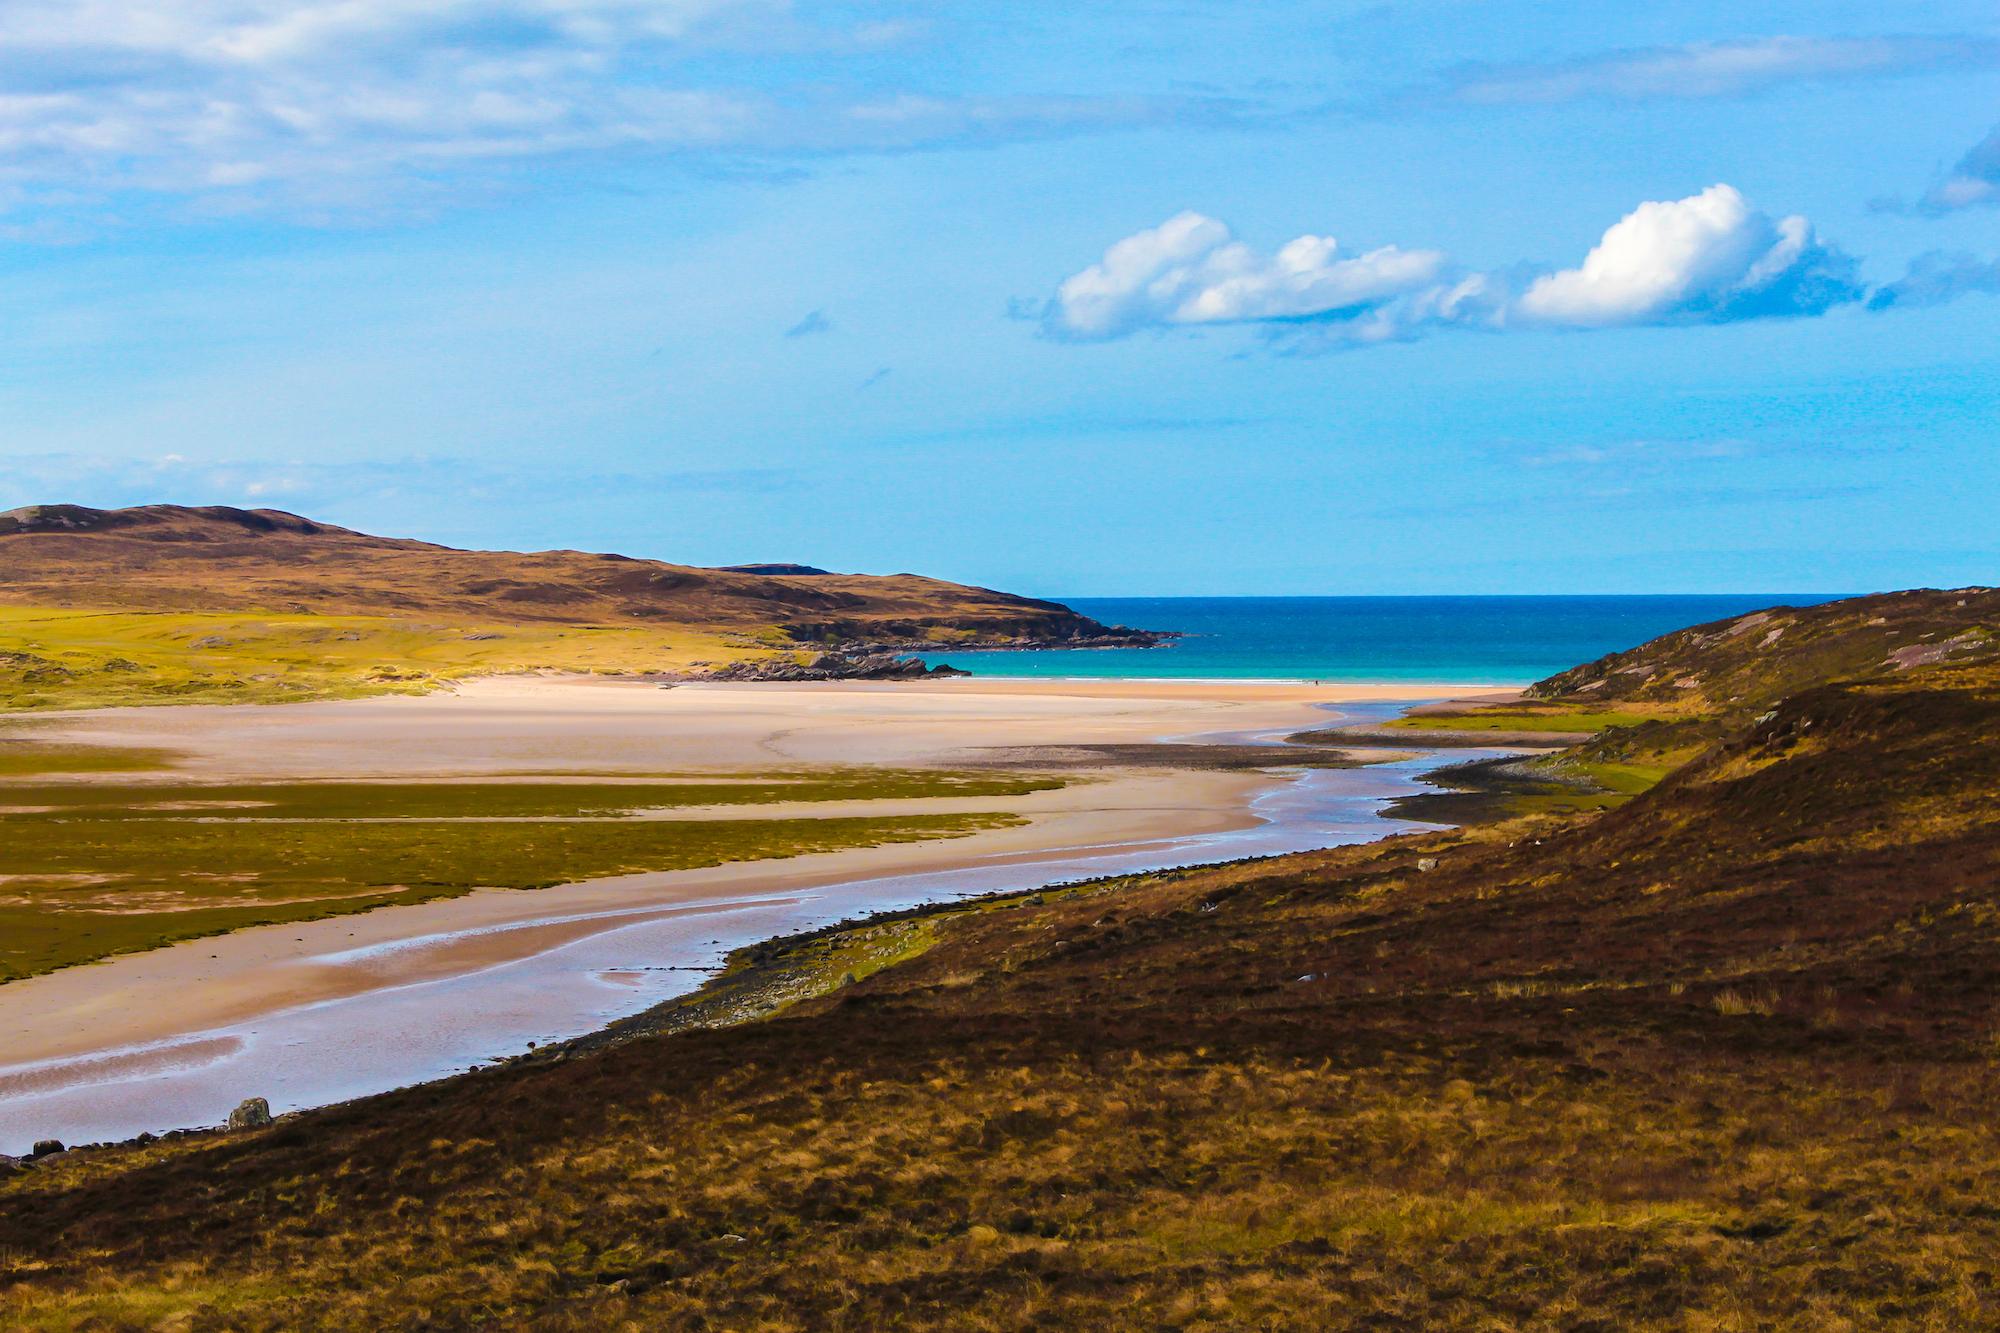 (68) Achnahaird beach looking to Enard Bay, Coigach, West coast of Scotland. Copyright David Wheater.jpg